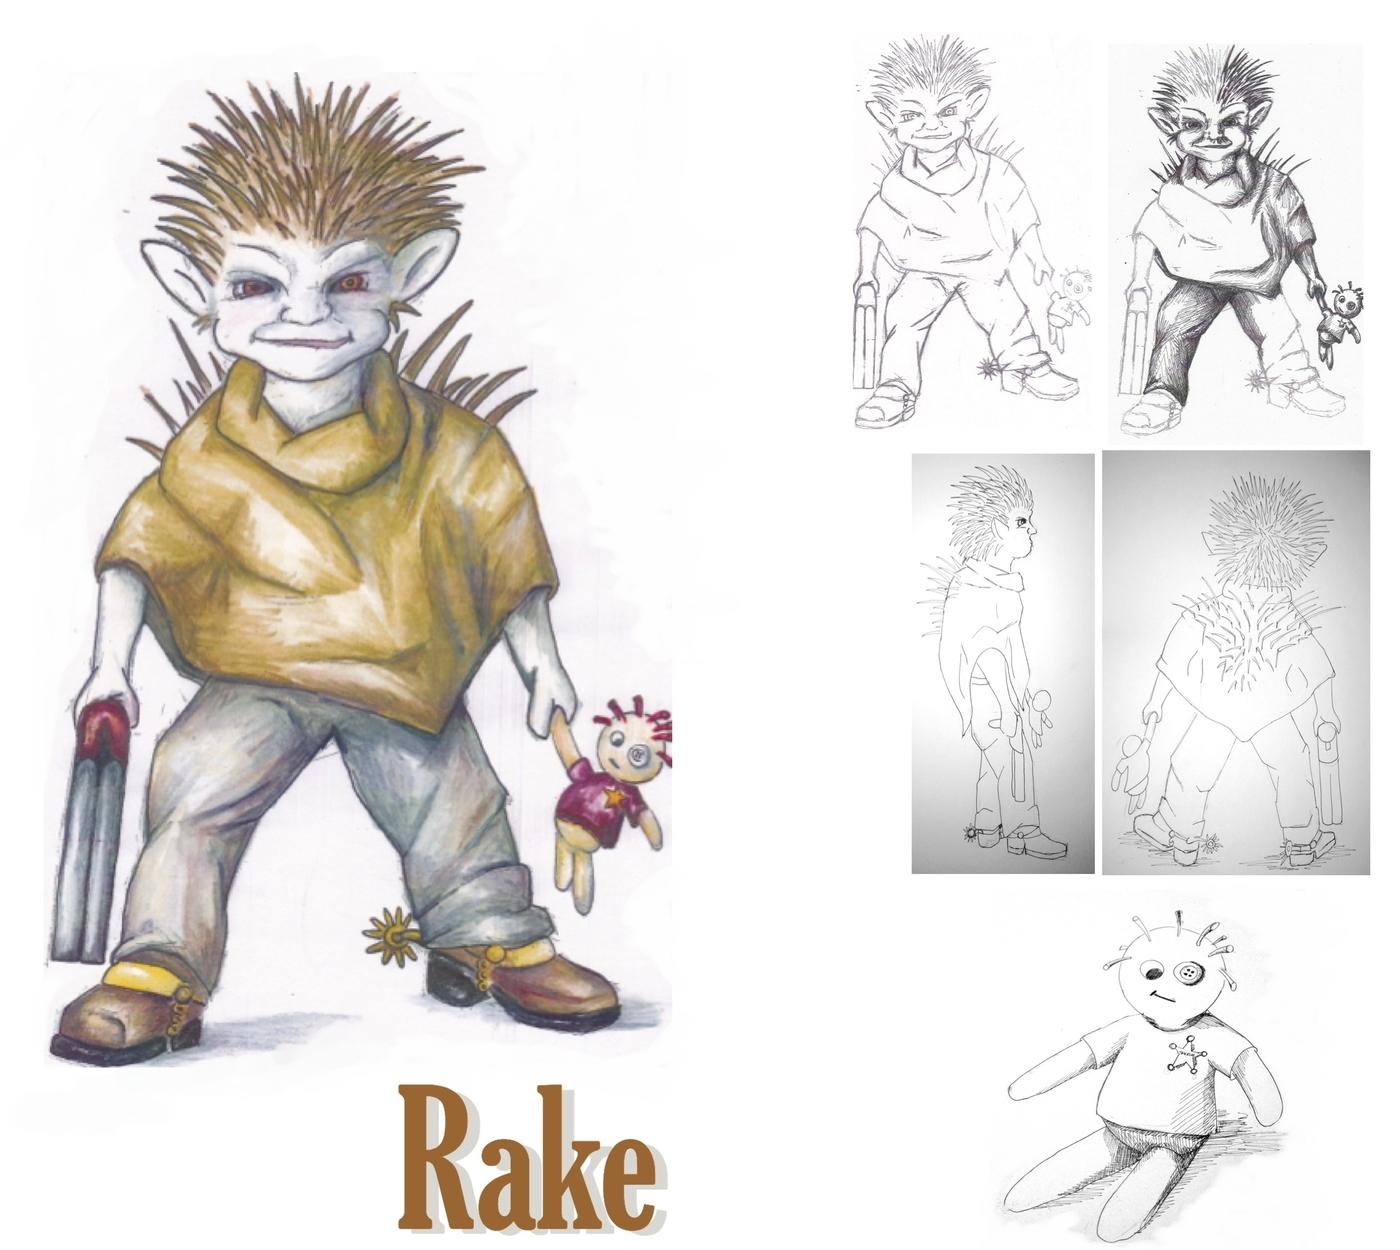 Rake Artwork by Catherine Newelll